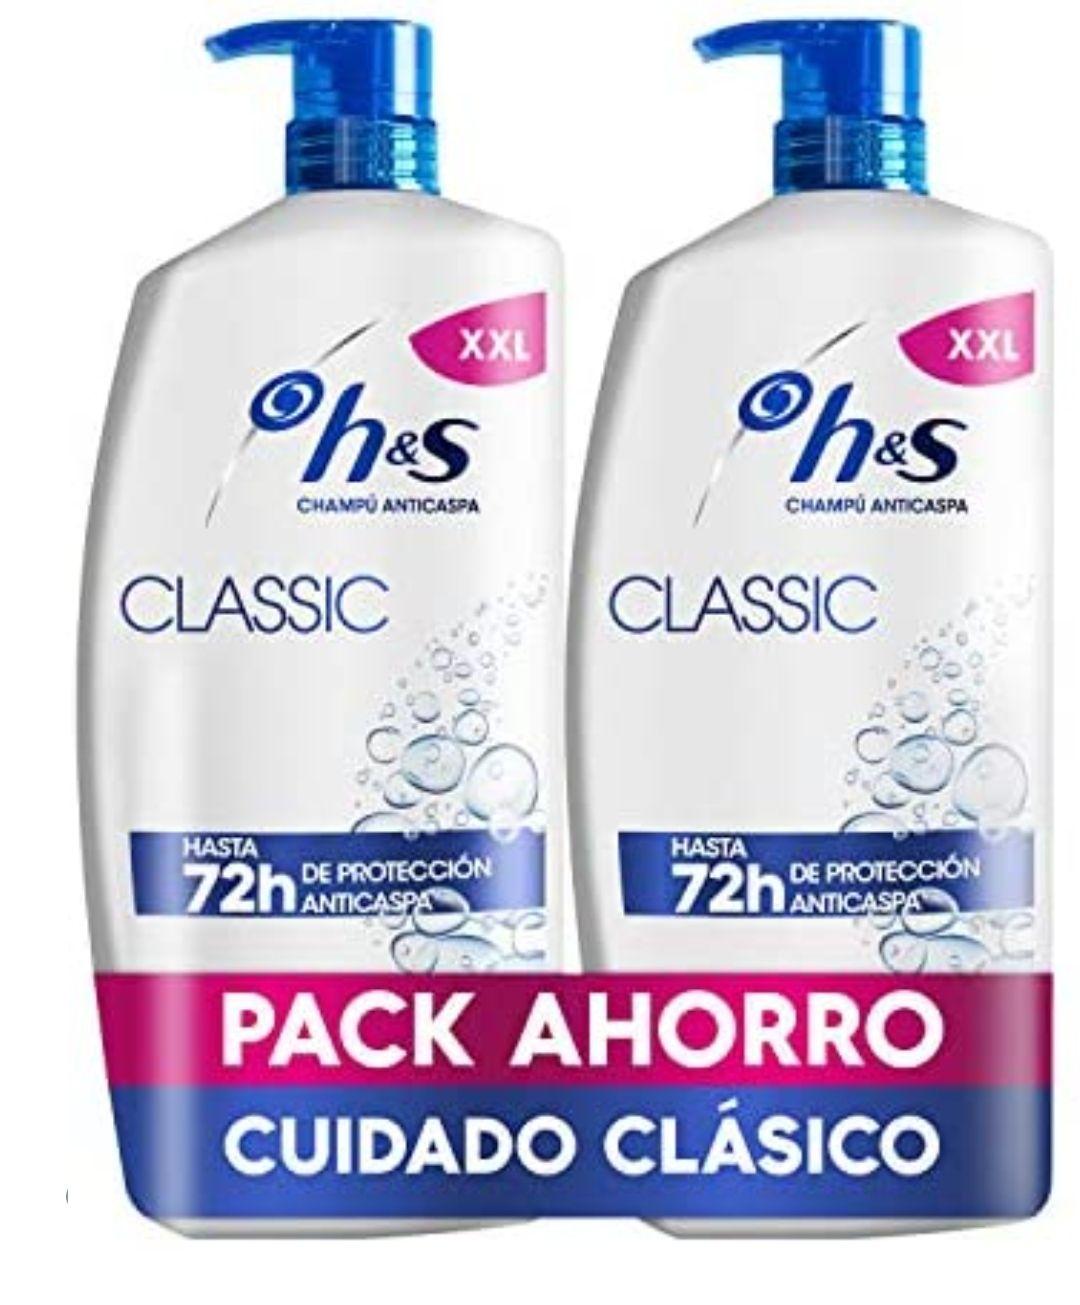 H&S Champú anticaspa